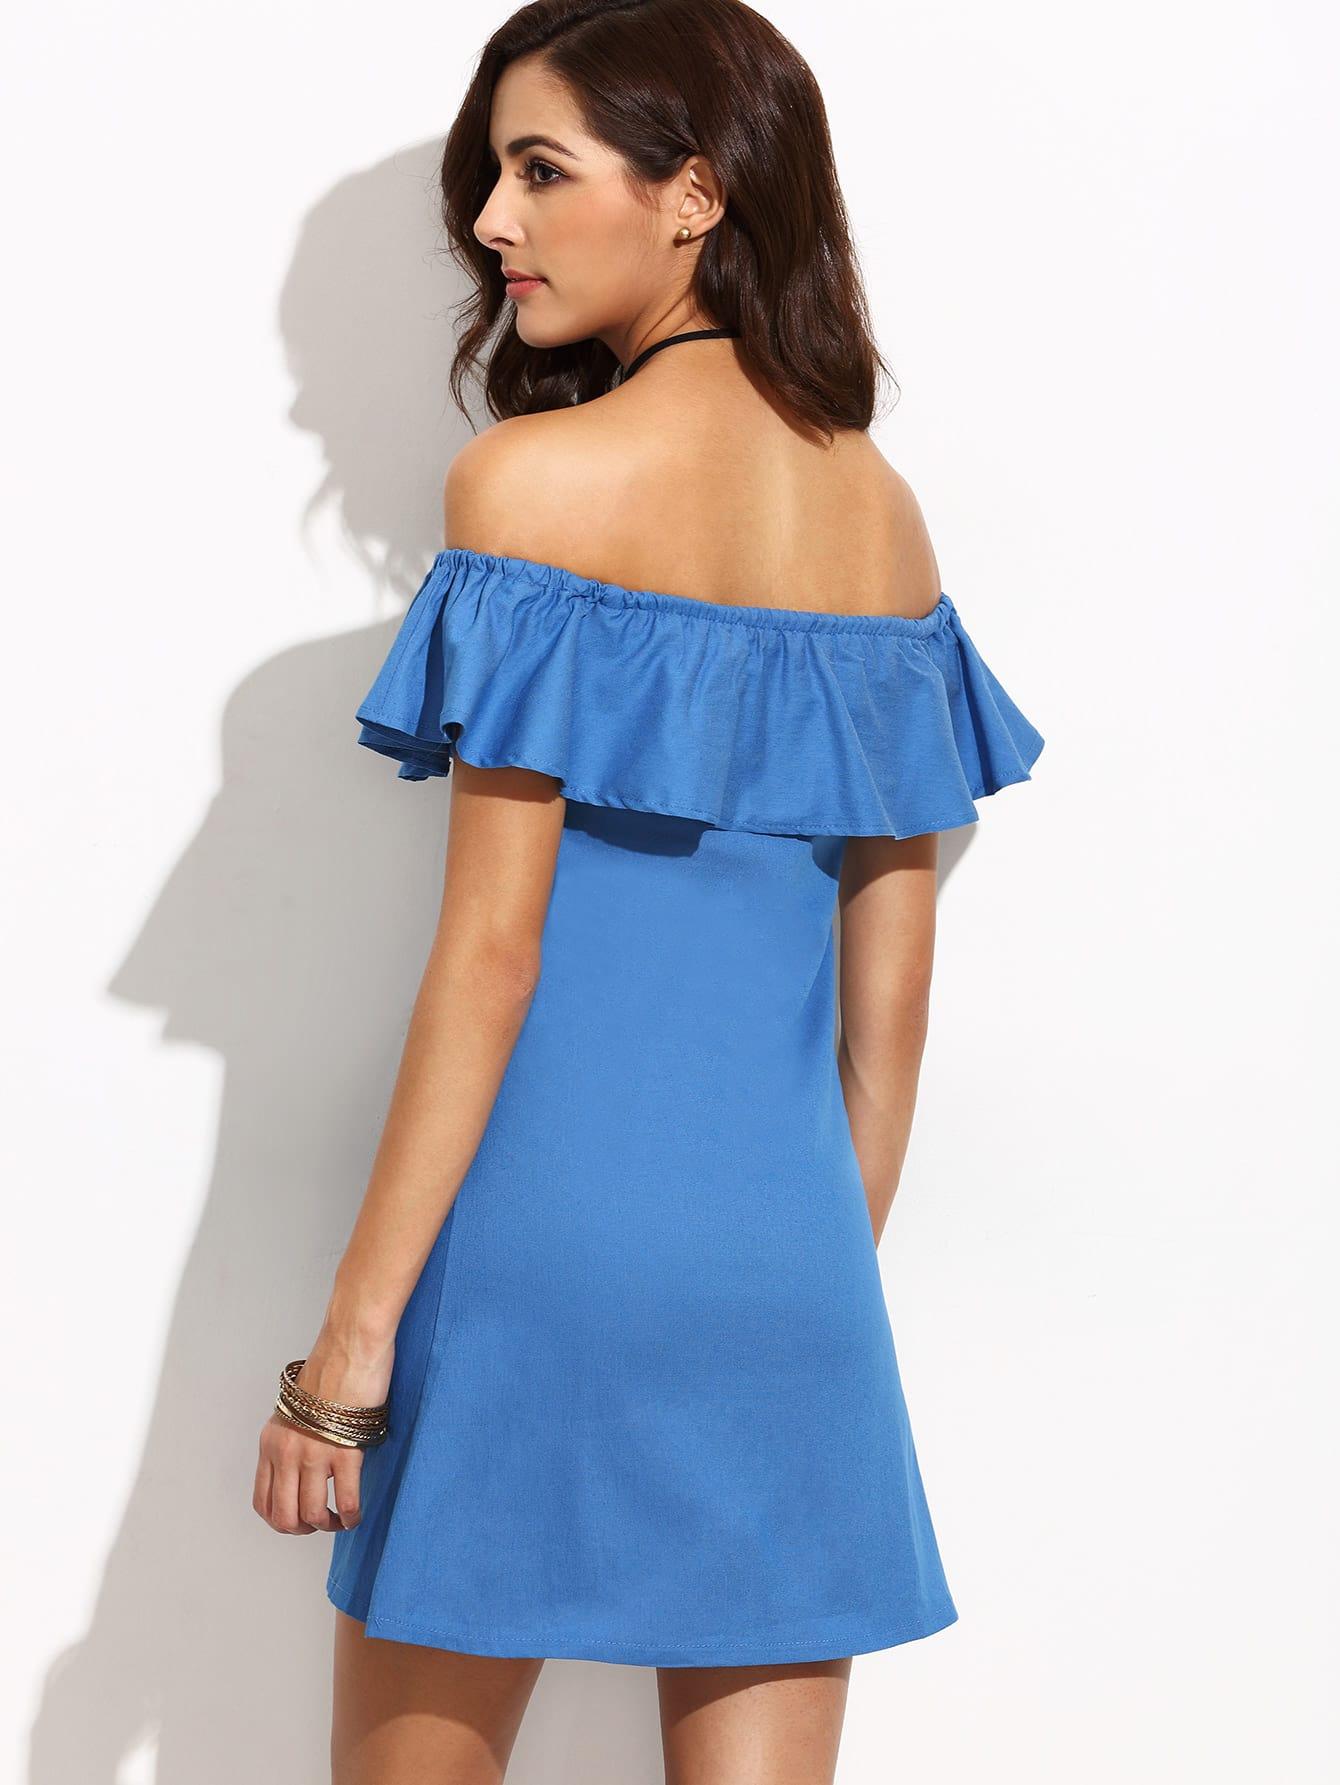 Off the Shoulder Dresses For Women-Us SheIn(Sheinside)